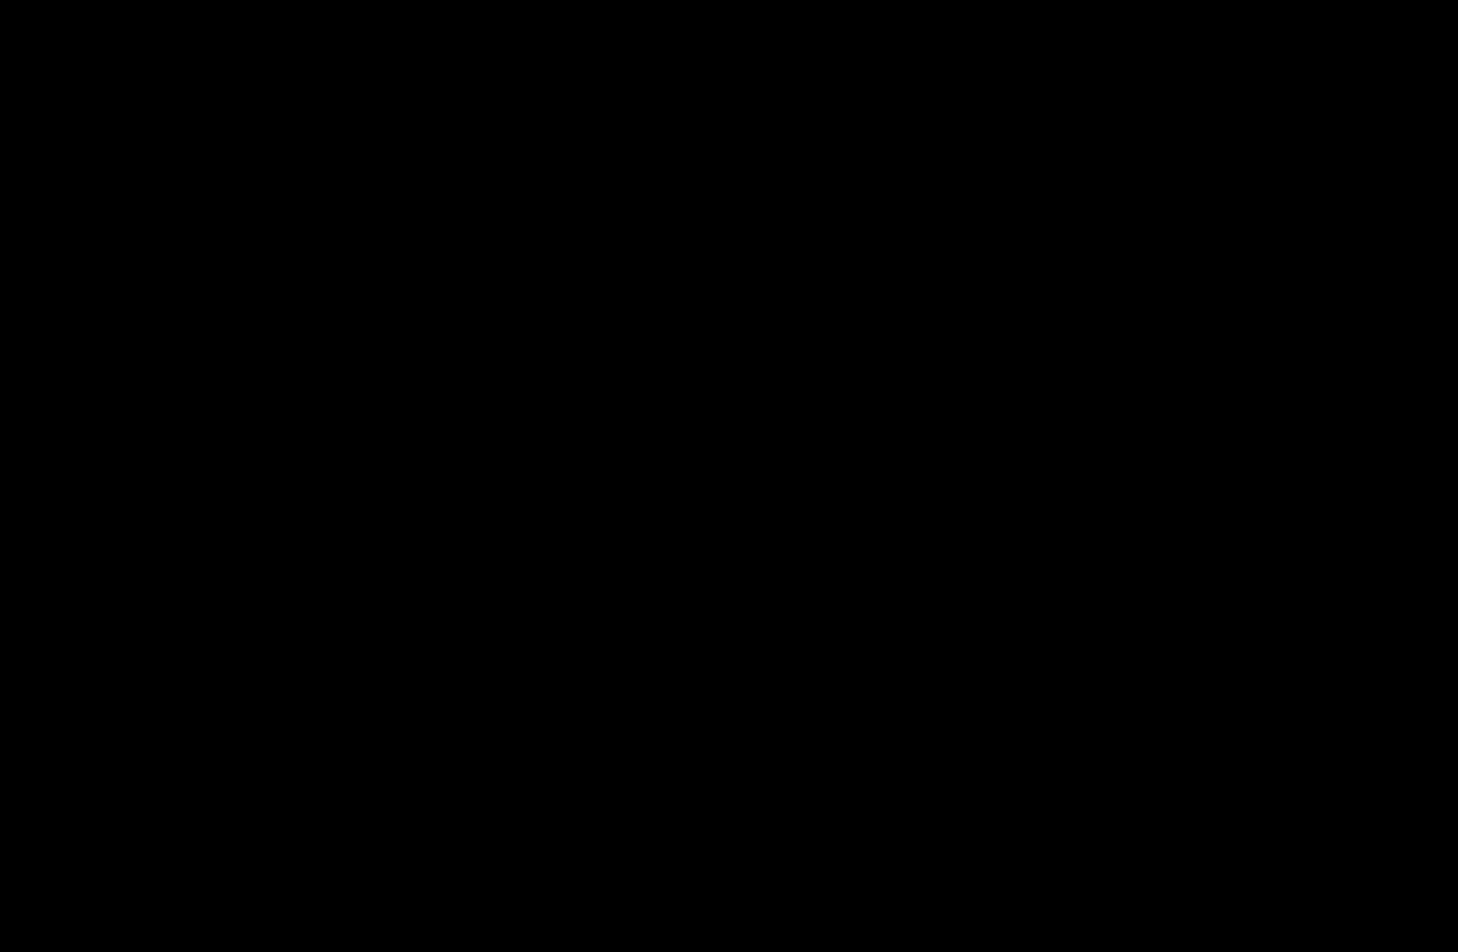 "Brushlettering in schwarz vom Schriftzug ""Happy Birthday"""